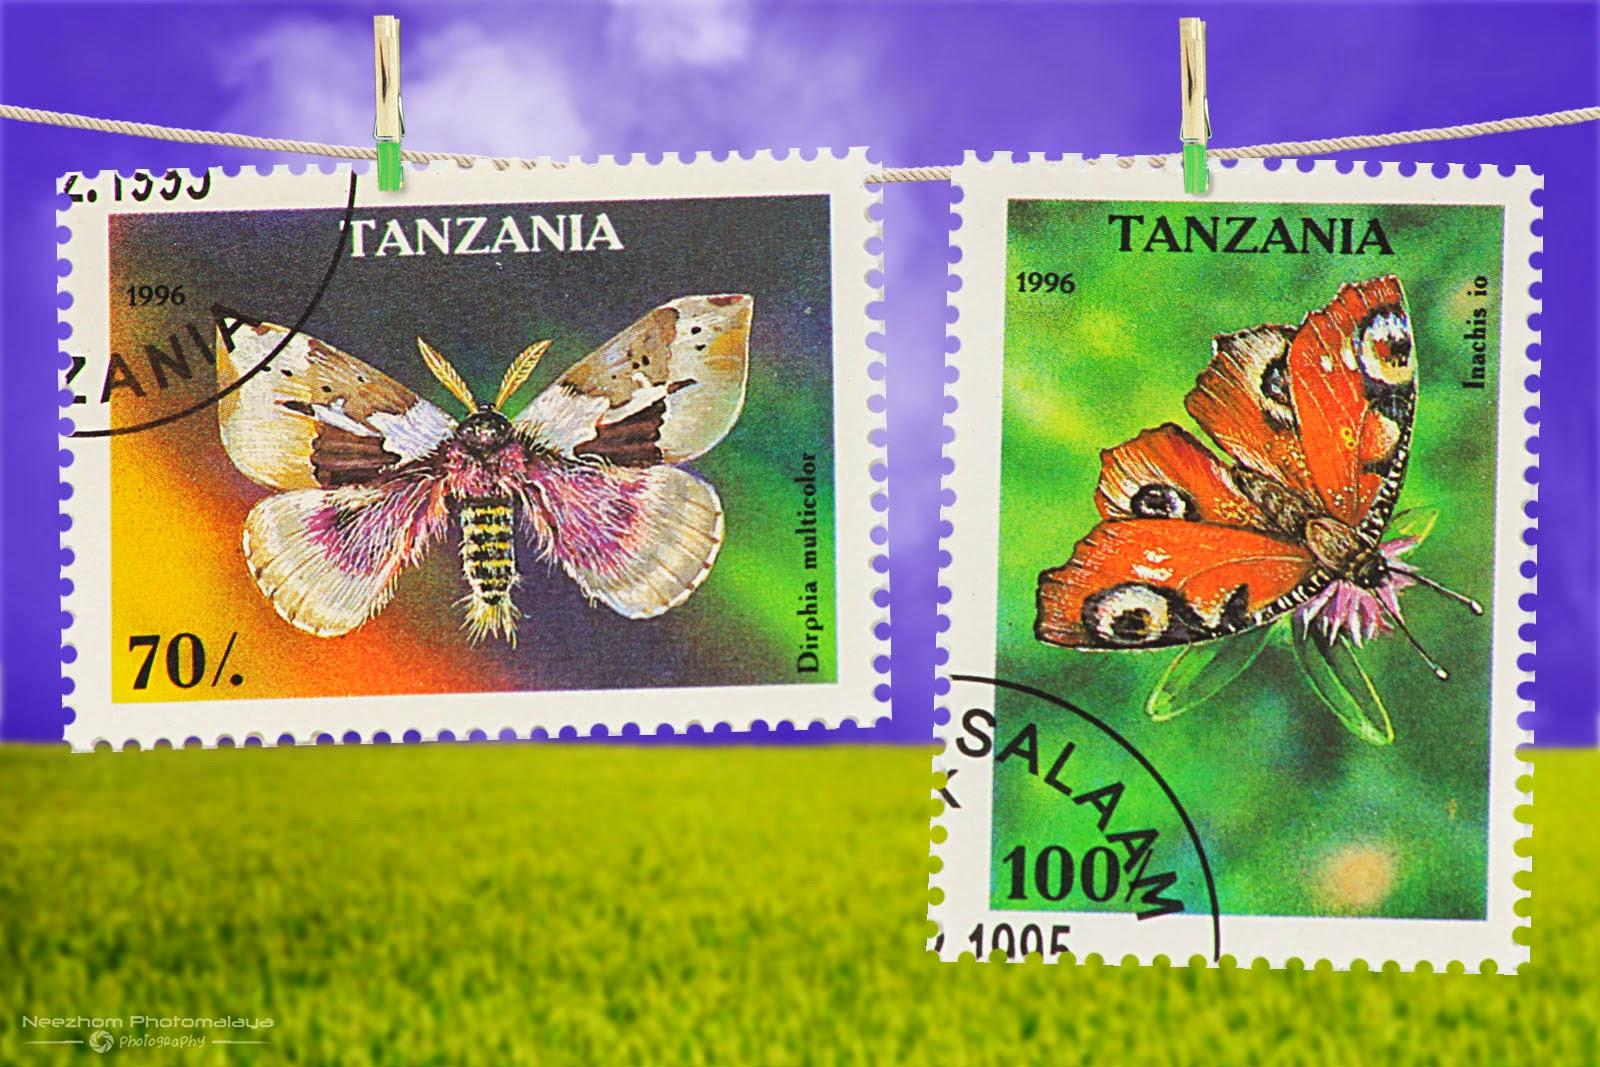 Tanzania Moth stamps 1996 - Dirphia multicolor, Inachis io